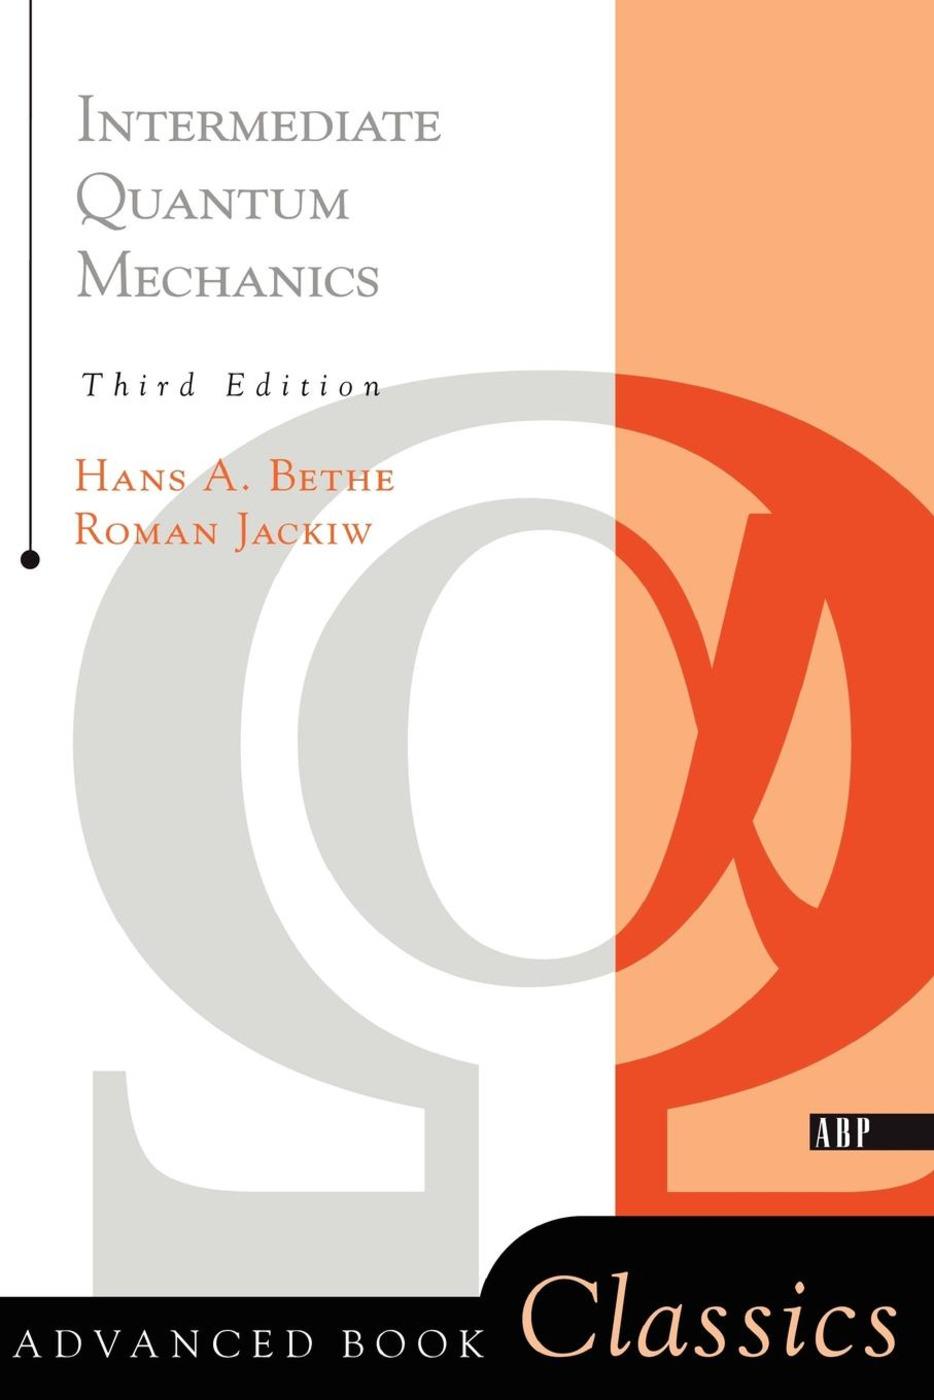 Intermediate Quantum Mechanics: Third Edition, 3rd Edition (Paperback) book cover